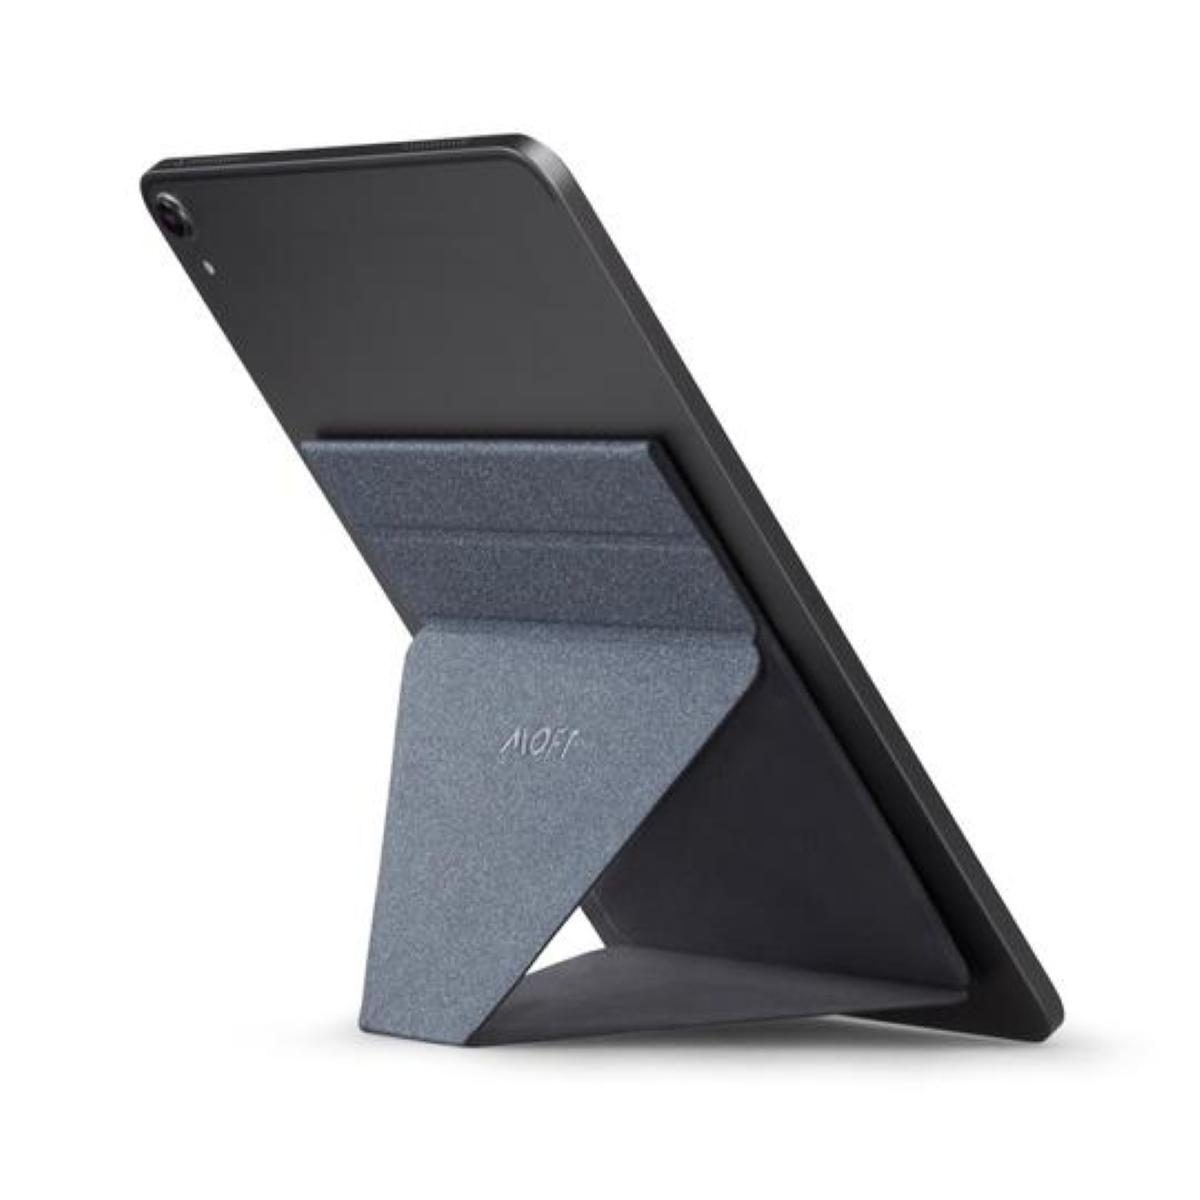 MOFT X Tablet Stand - Ergonomic Design